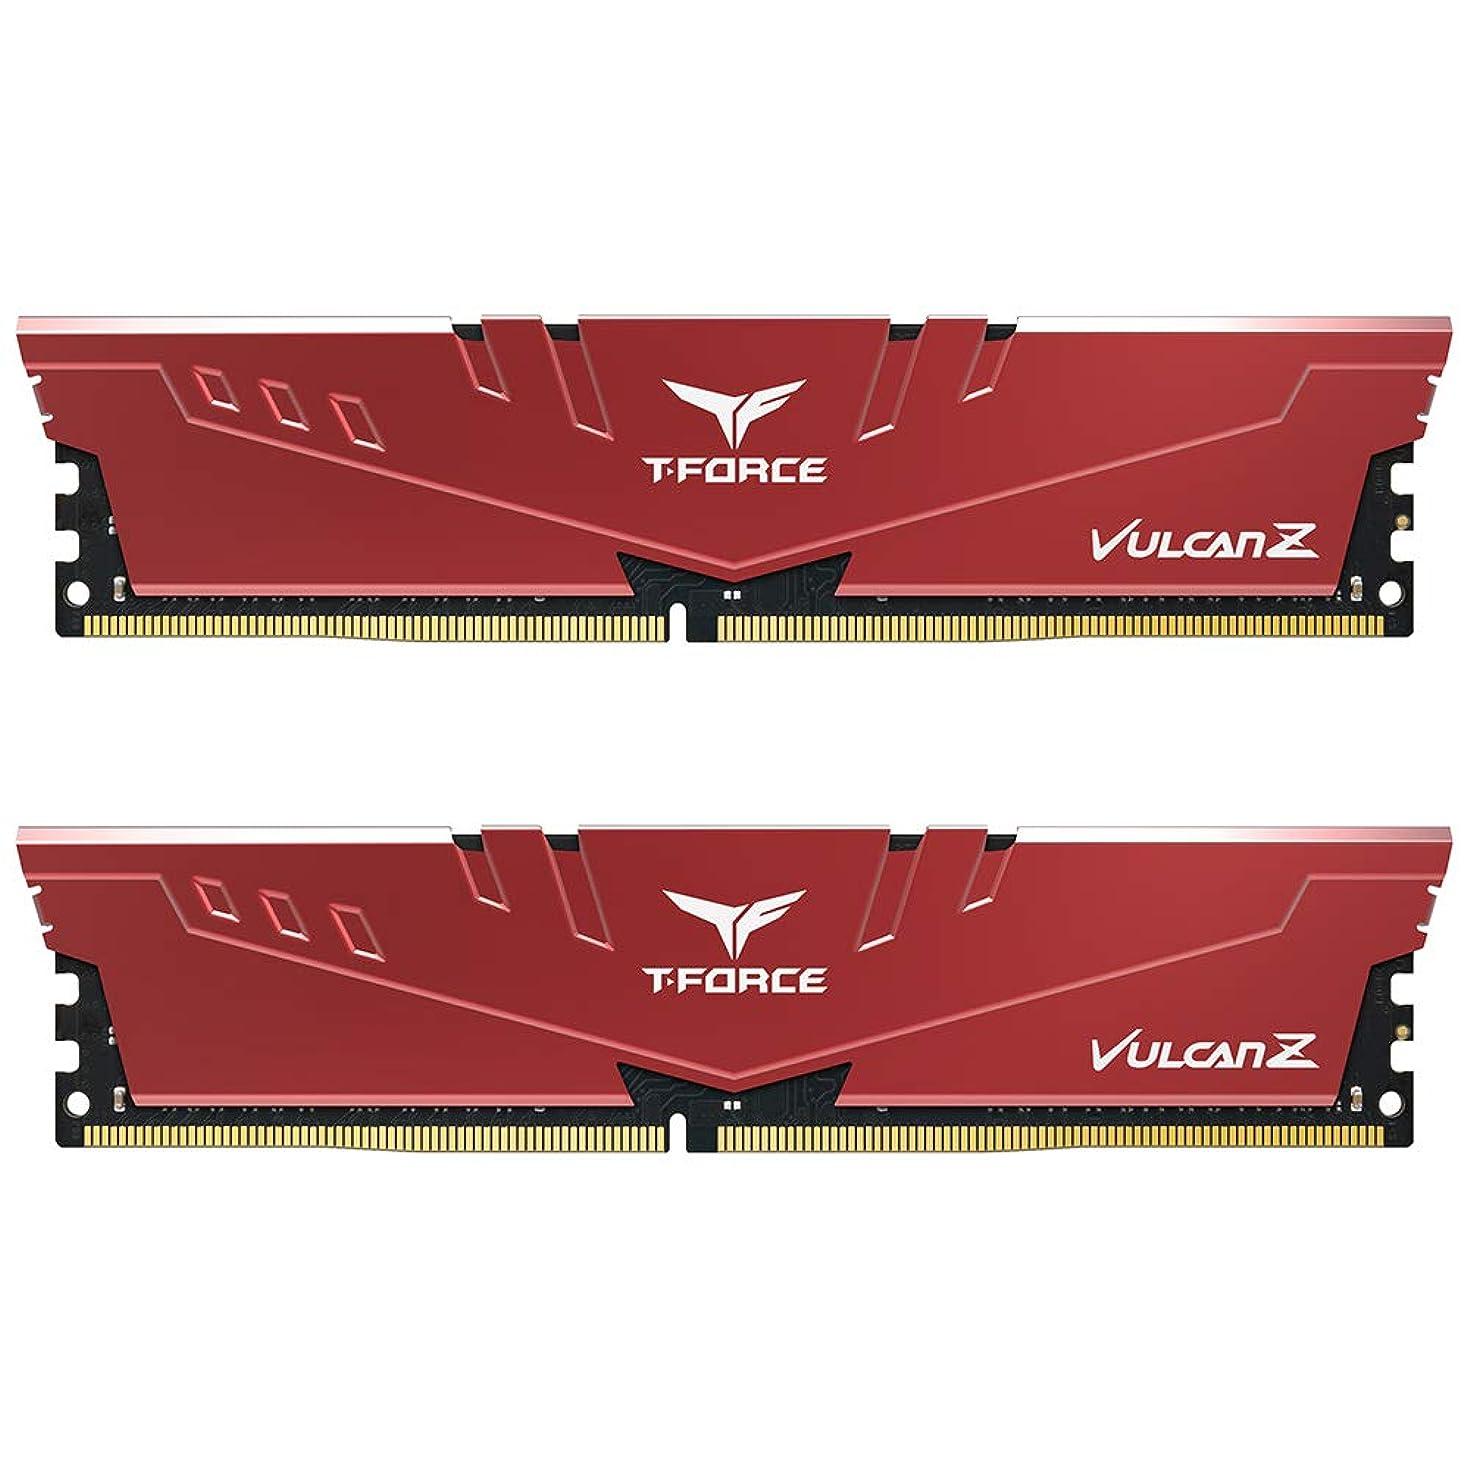 TEAMGROUP T-Force VulcanZ DDR4 16GB Kit (2 x 8GB) 3000MHz (PC4 24000) CL16 Desktop Memory Module Ram - Red - TLZRD416G3000HC16CDC01